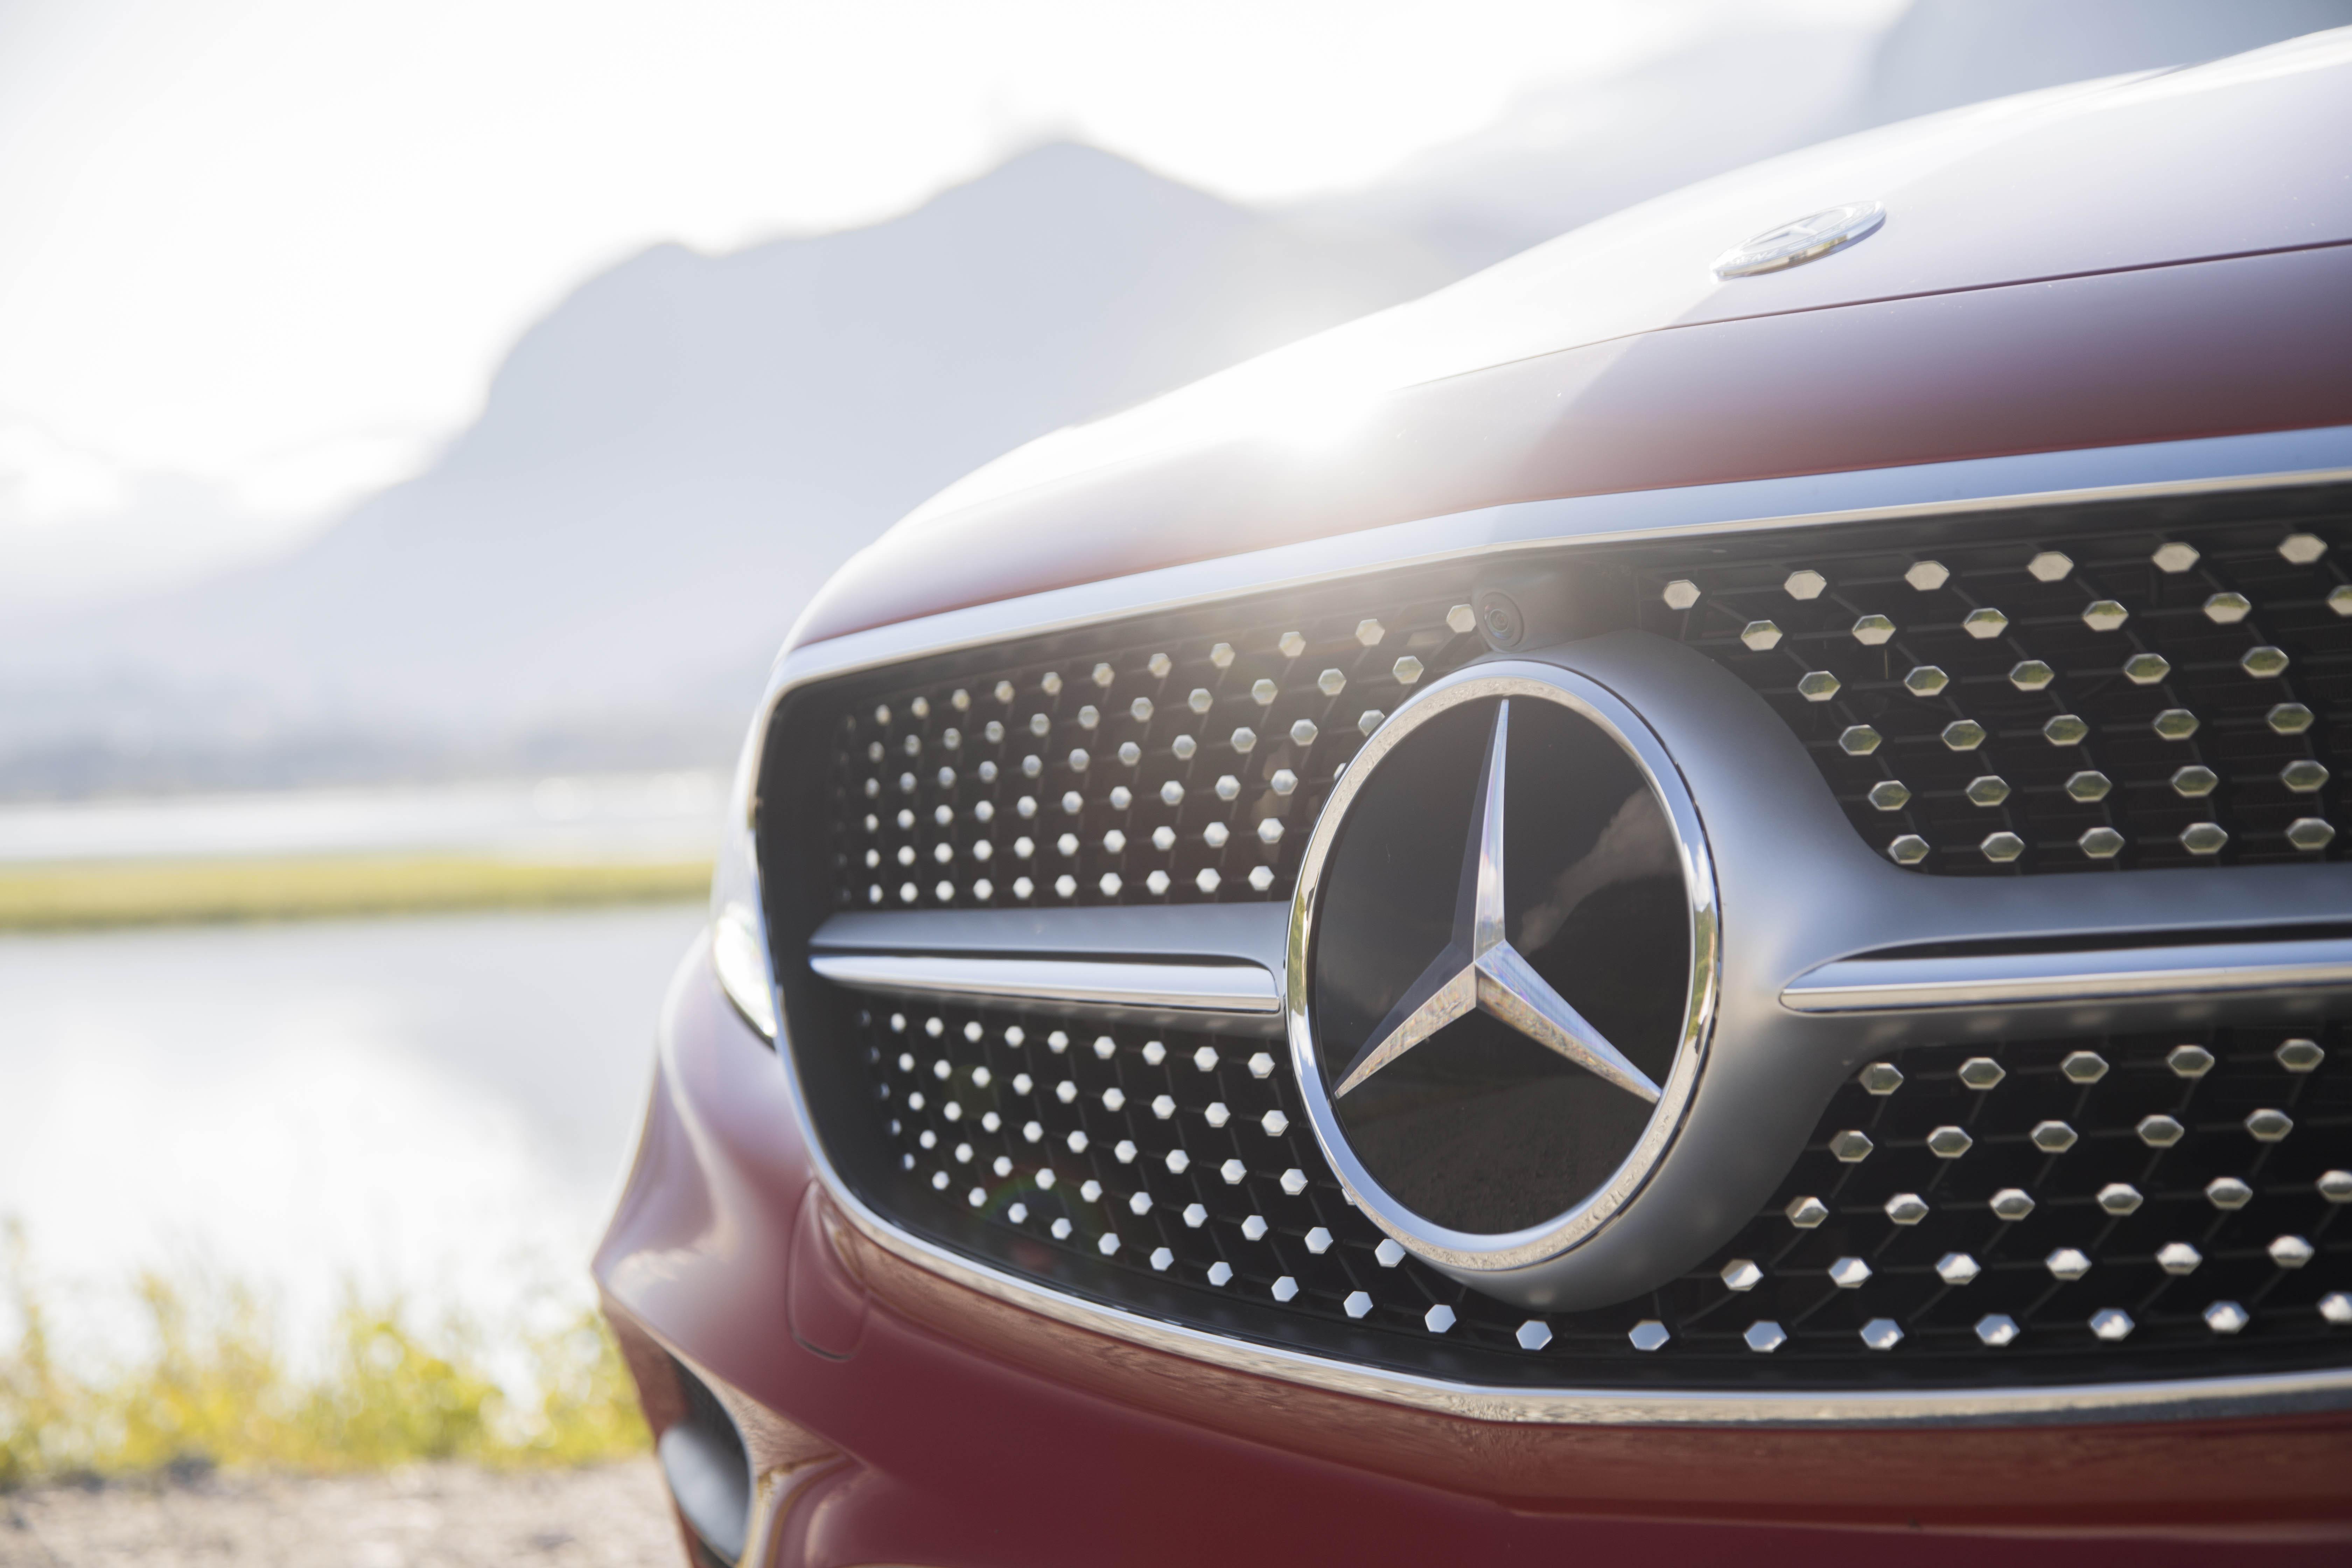 2018 Mercedes E-Class Coupe